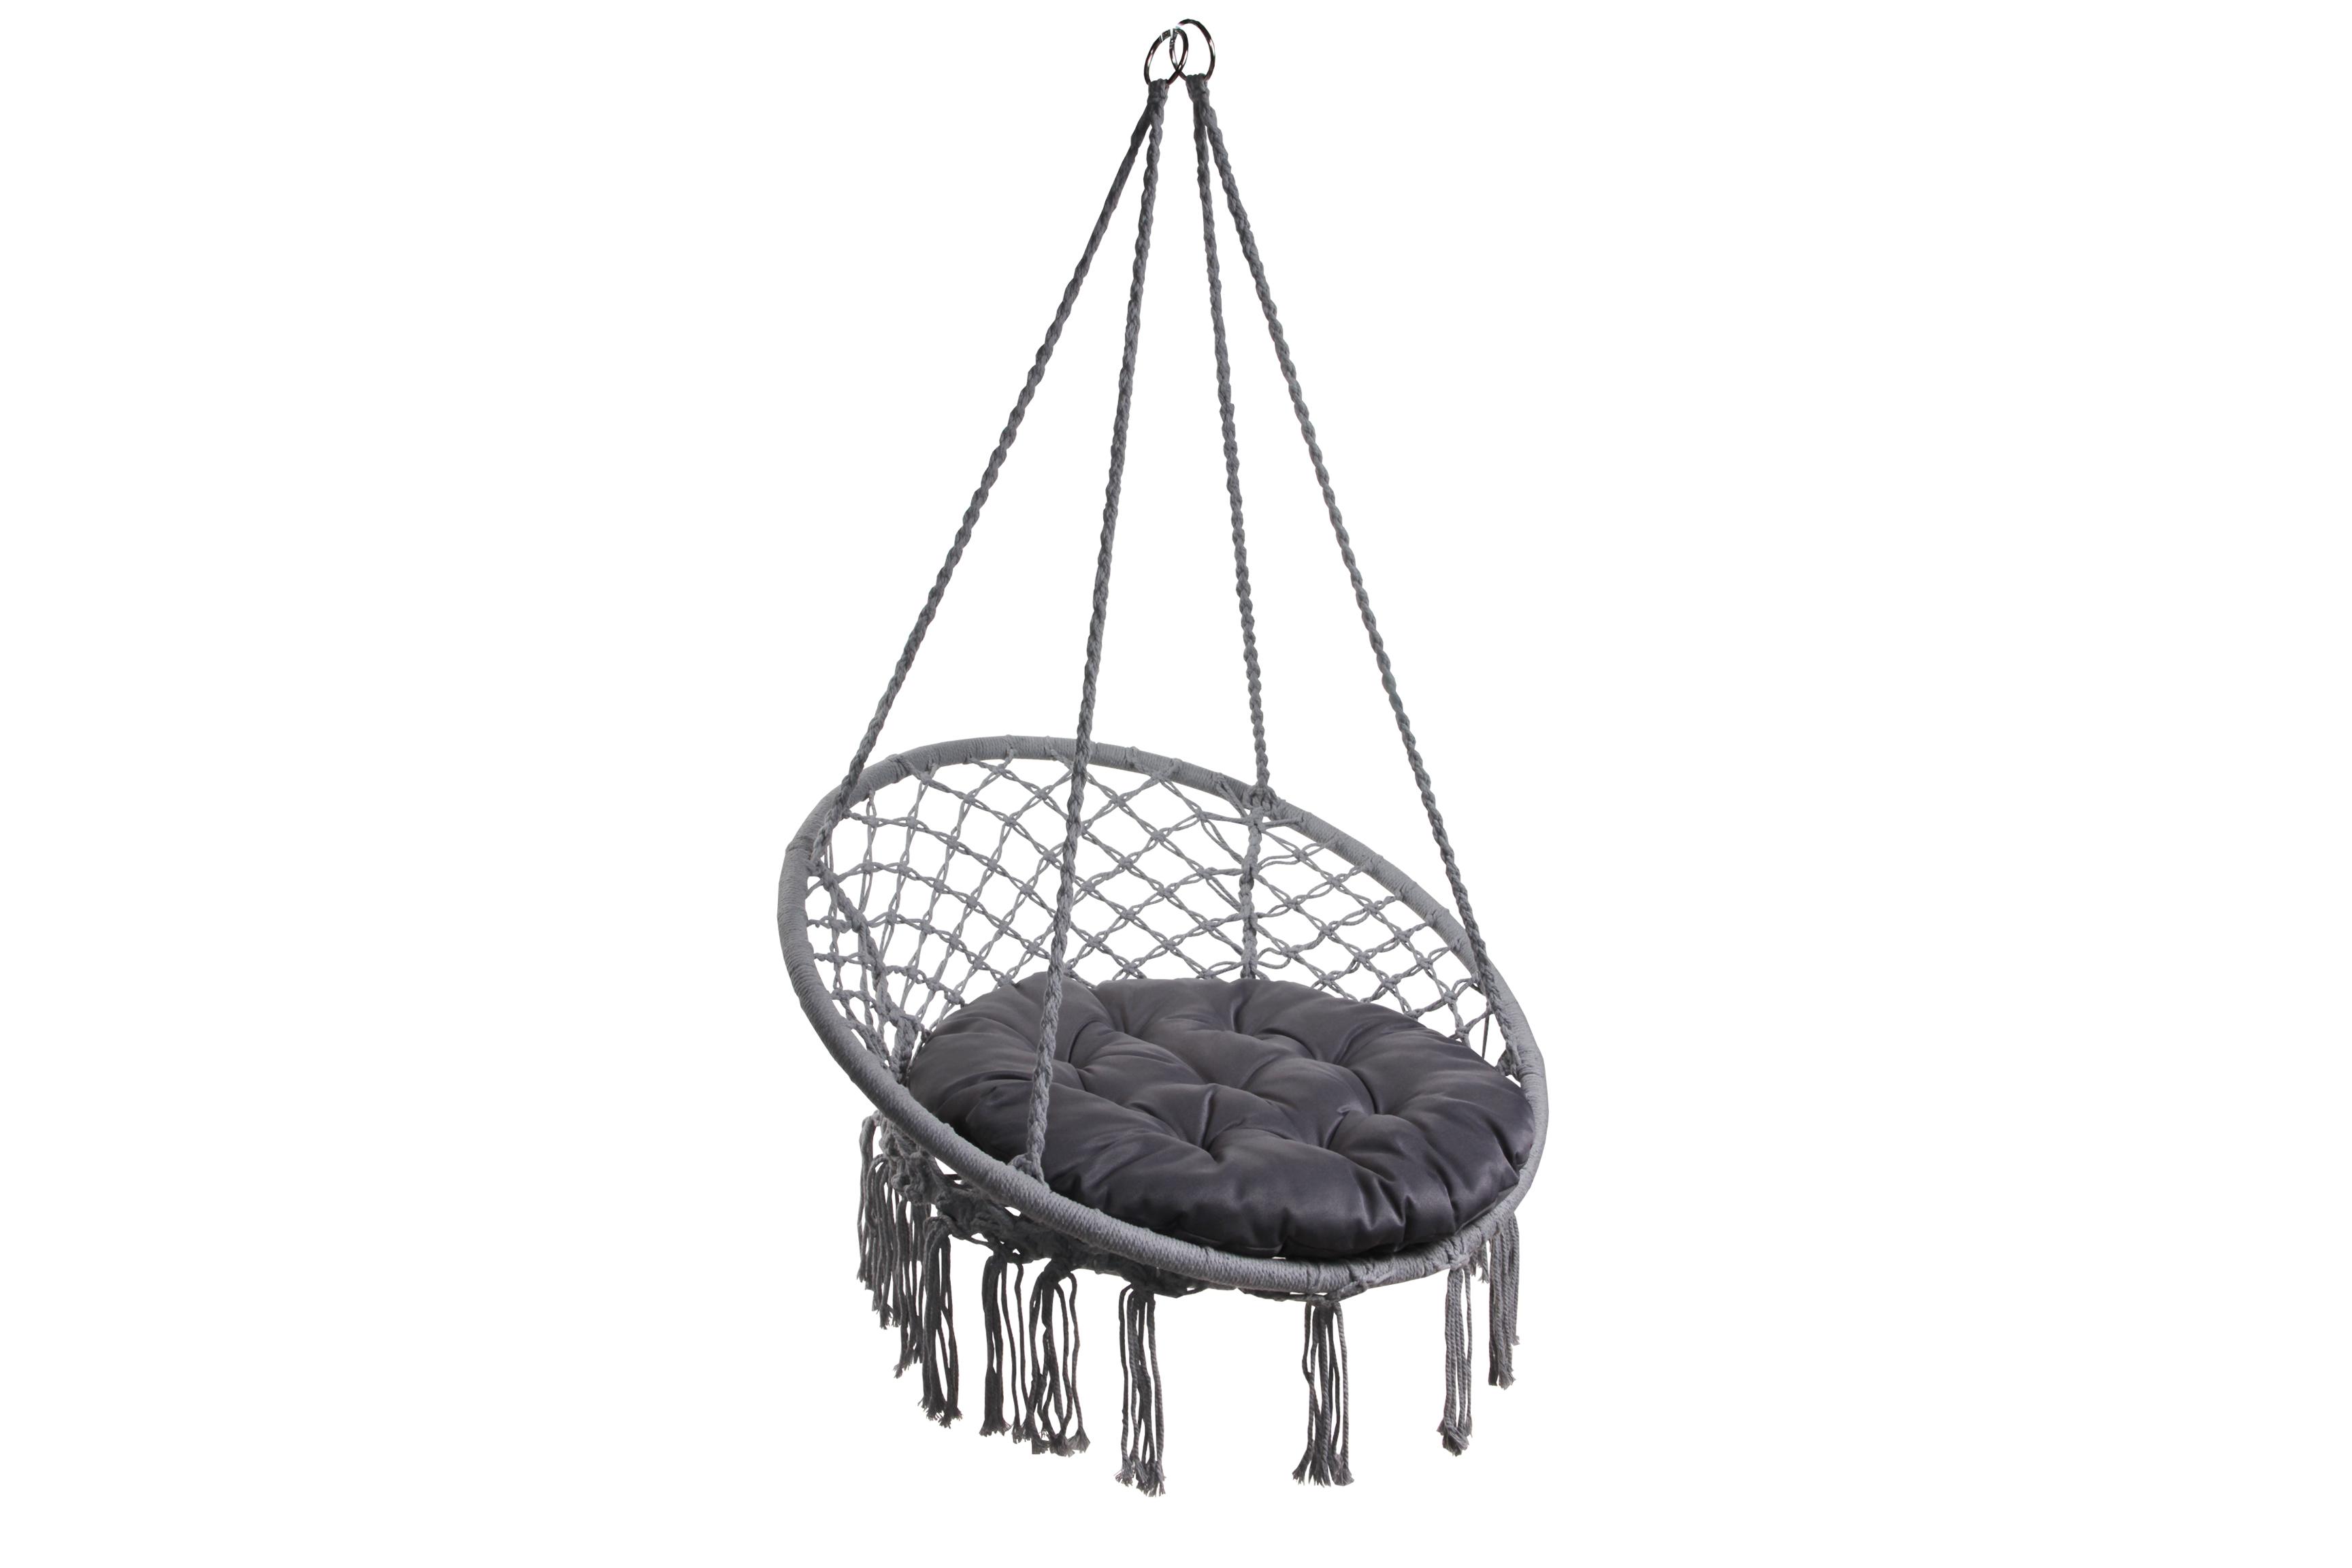 Подушка для кресла-гамака плетеного круглая RGPK-1 серый